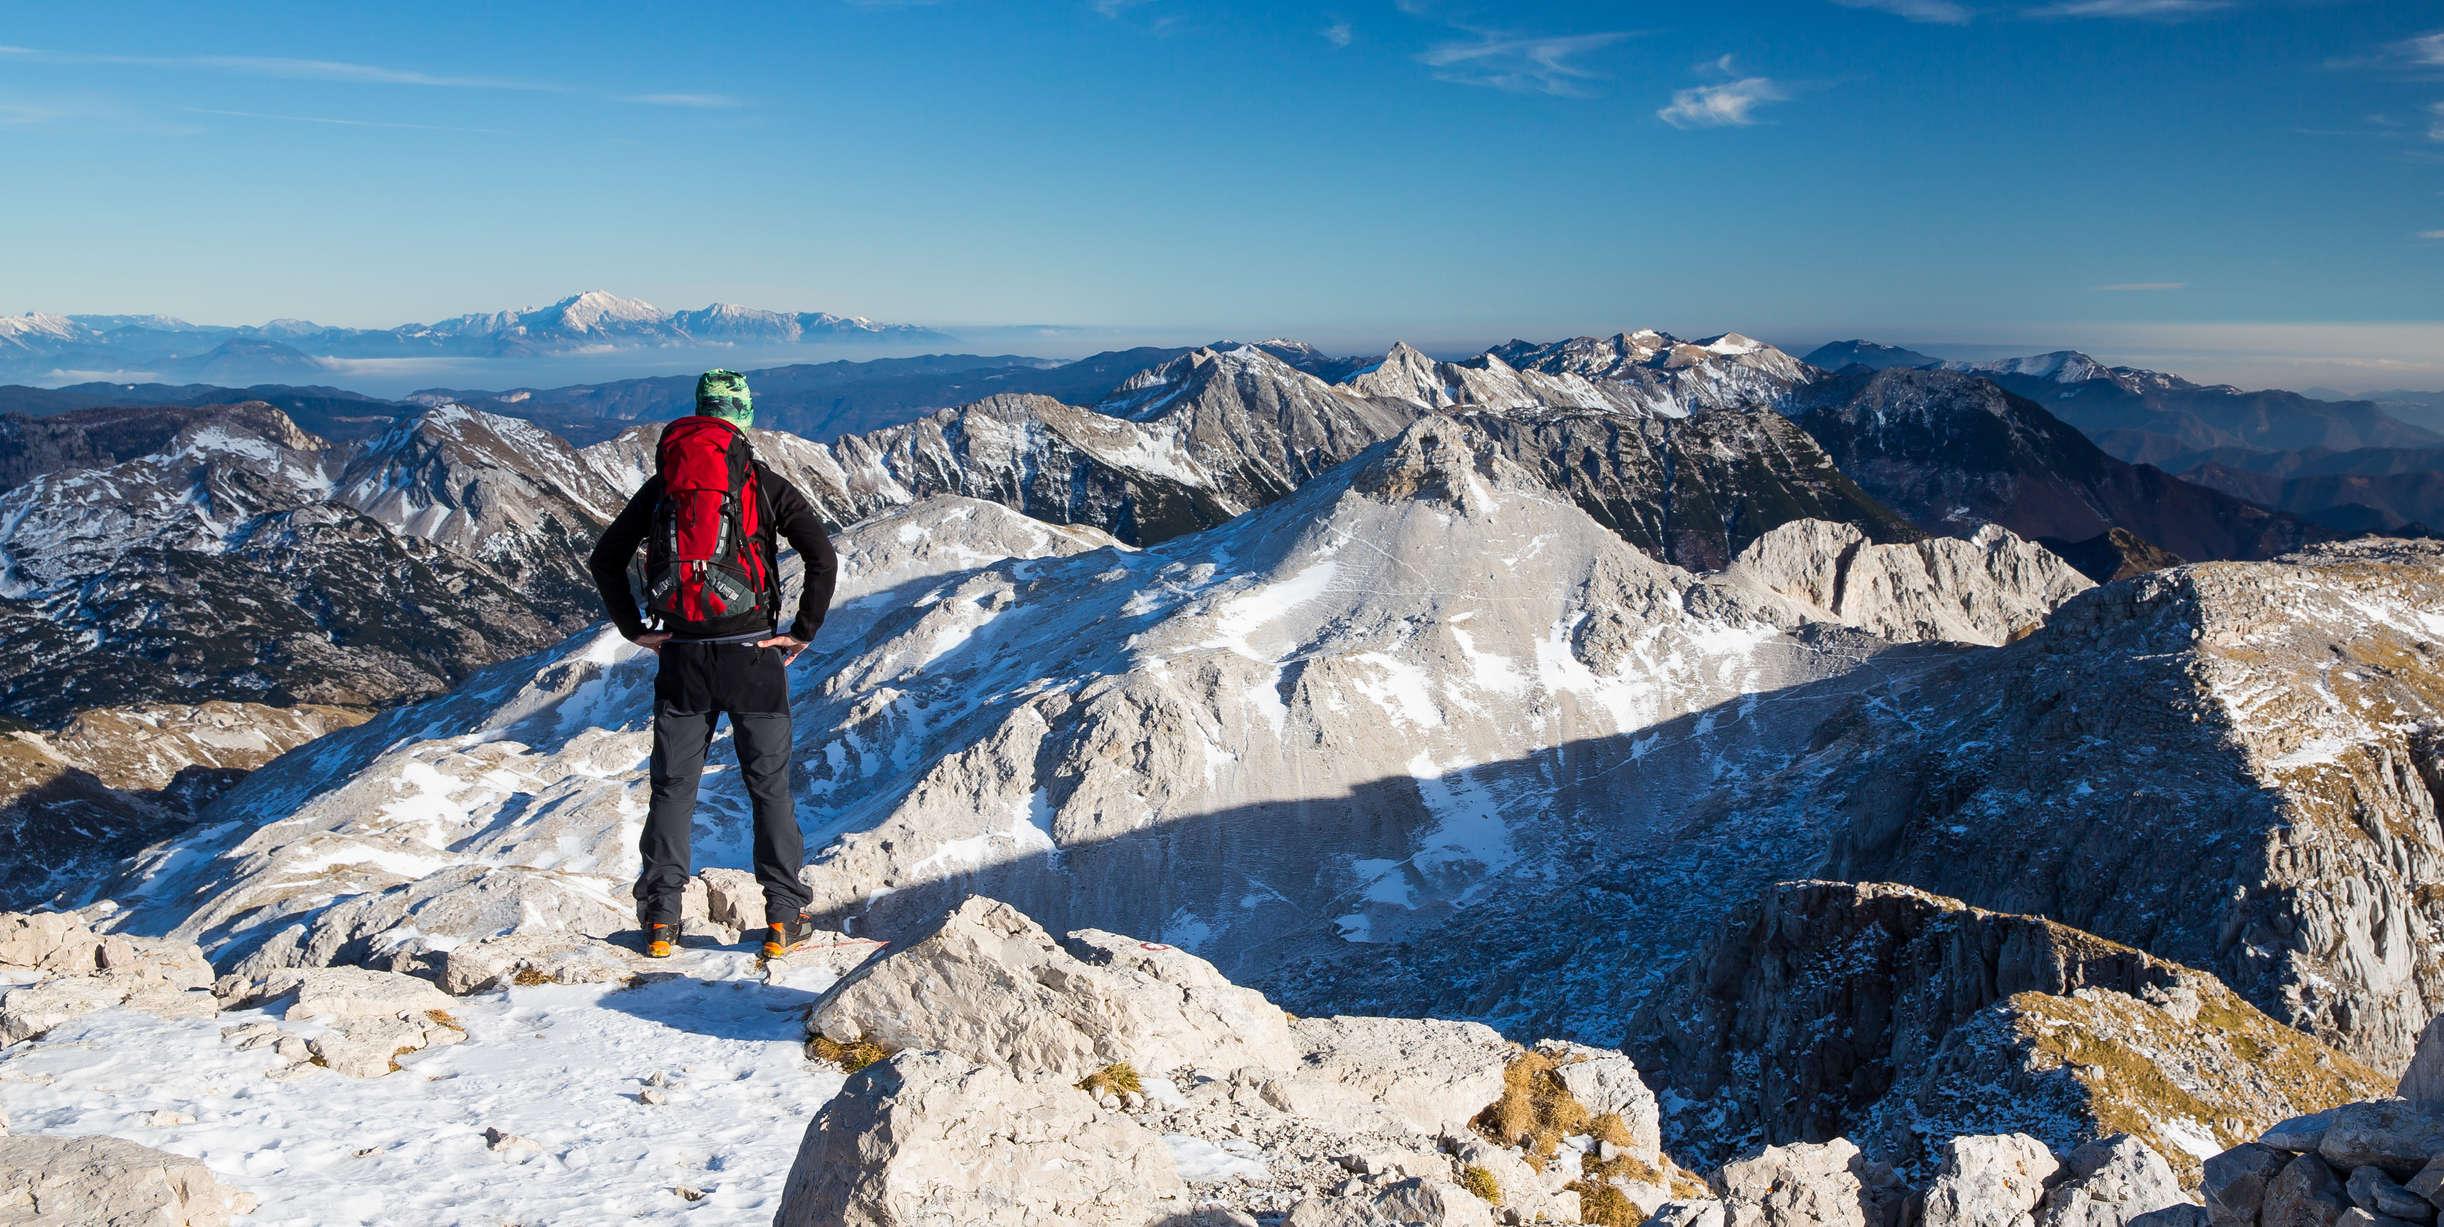 Slovenia's highest ski resort comes back to life post lockdown